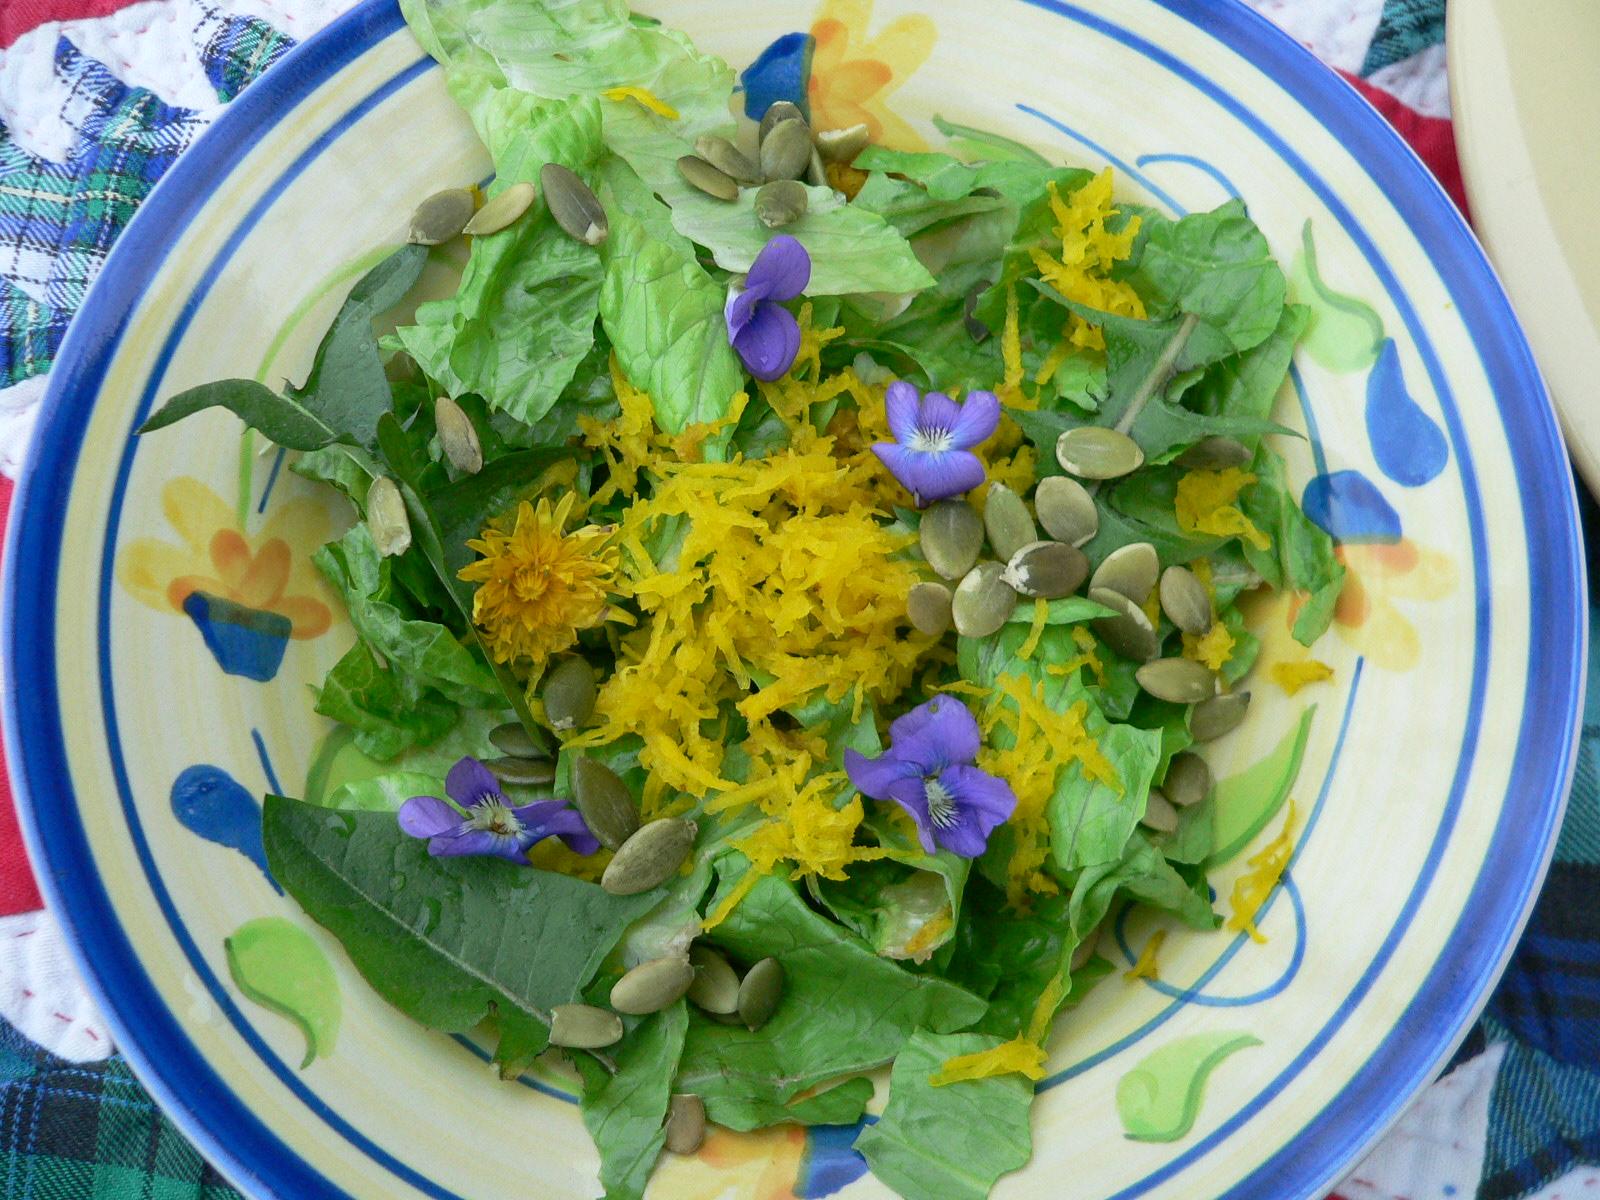 Wildflower salad violets